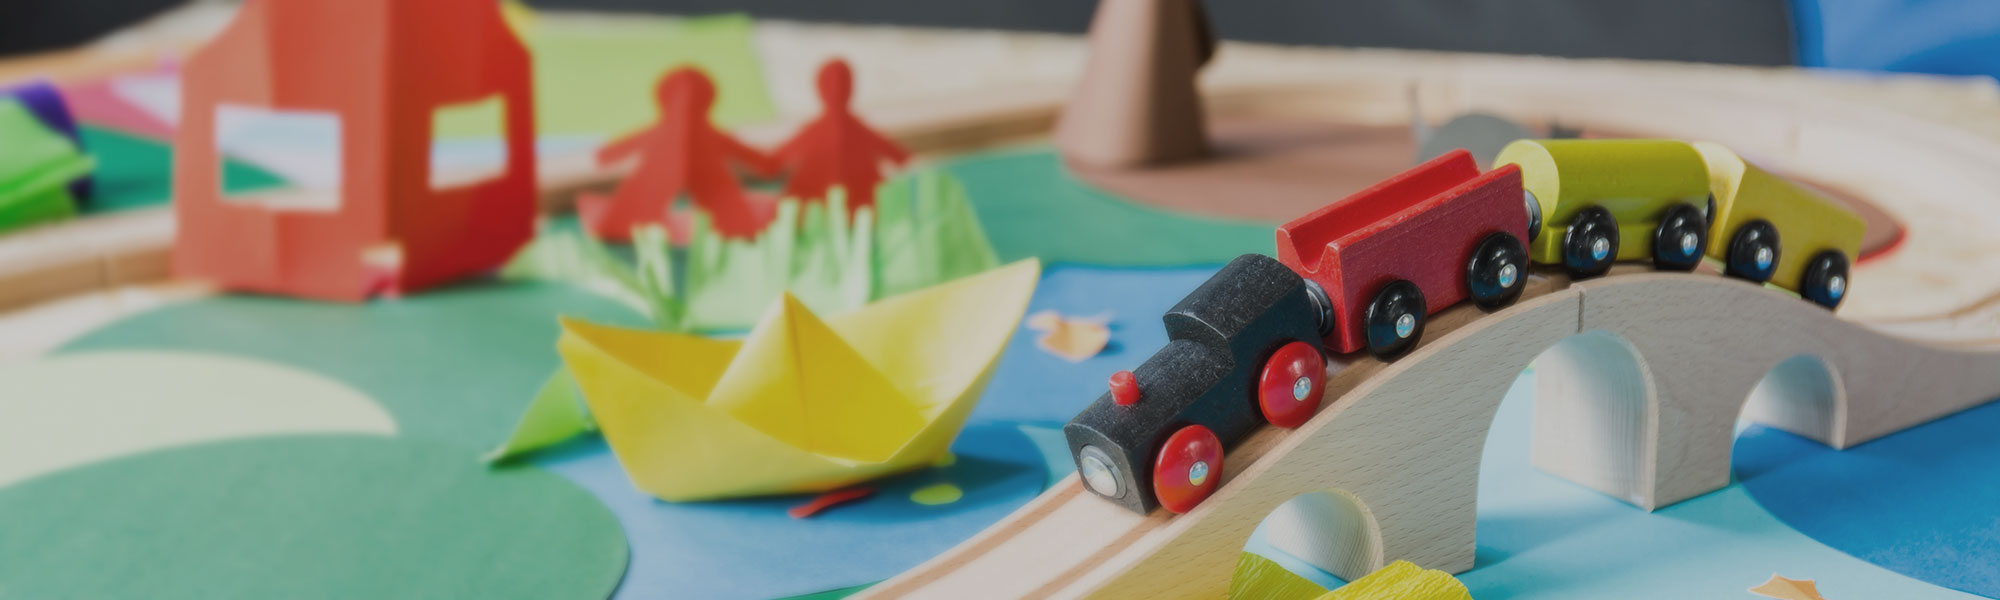 childcare in reno, nv